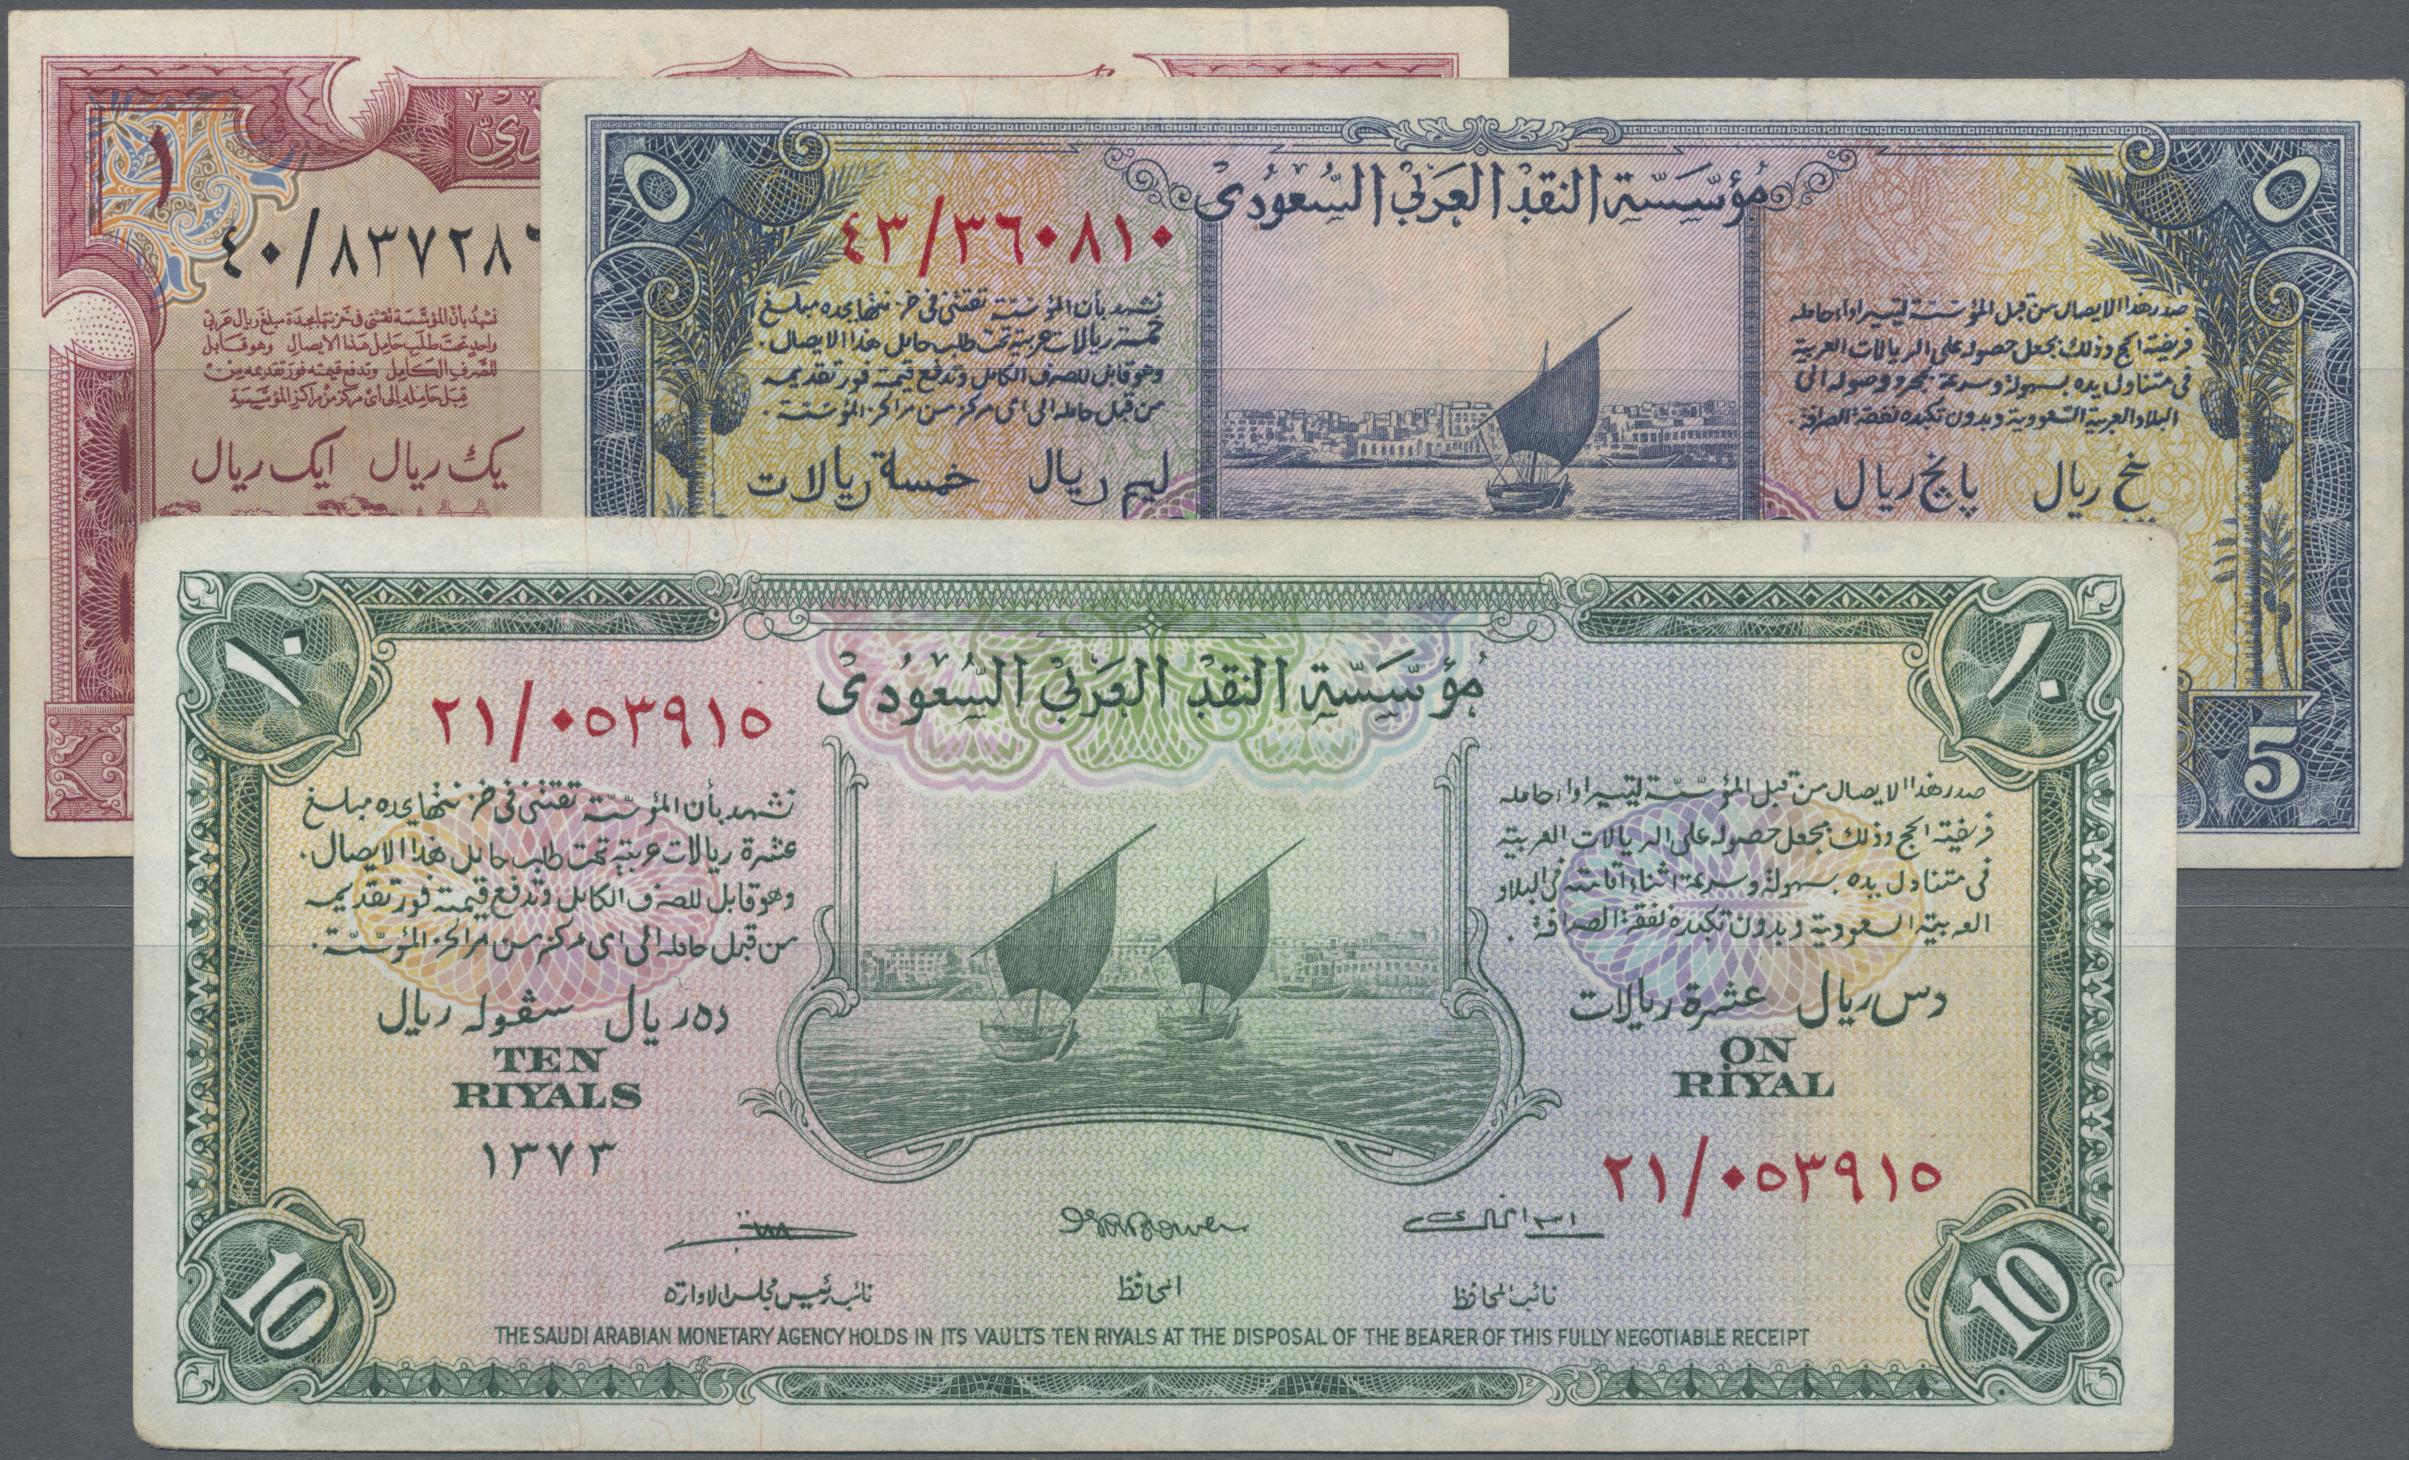 Lot 00217 - Saudi Arabia  / Saudi Arabien | Banknoten  -  Auktionshaus Christoph Gärtner GmbH & Co. KG 51th Auction - Day 1